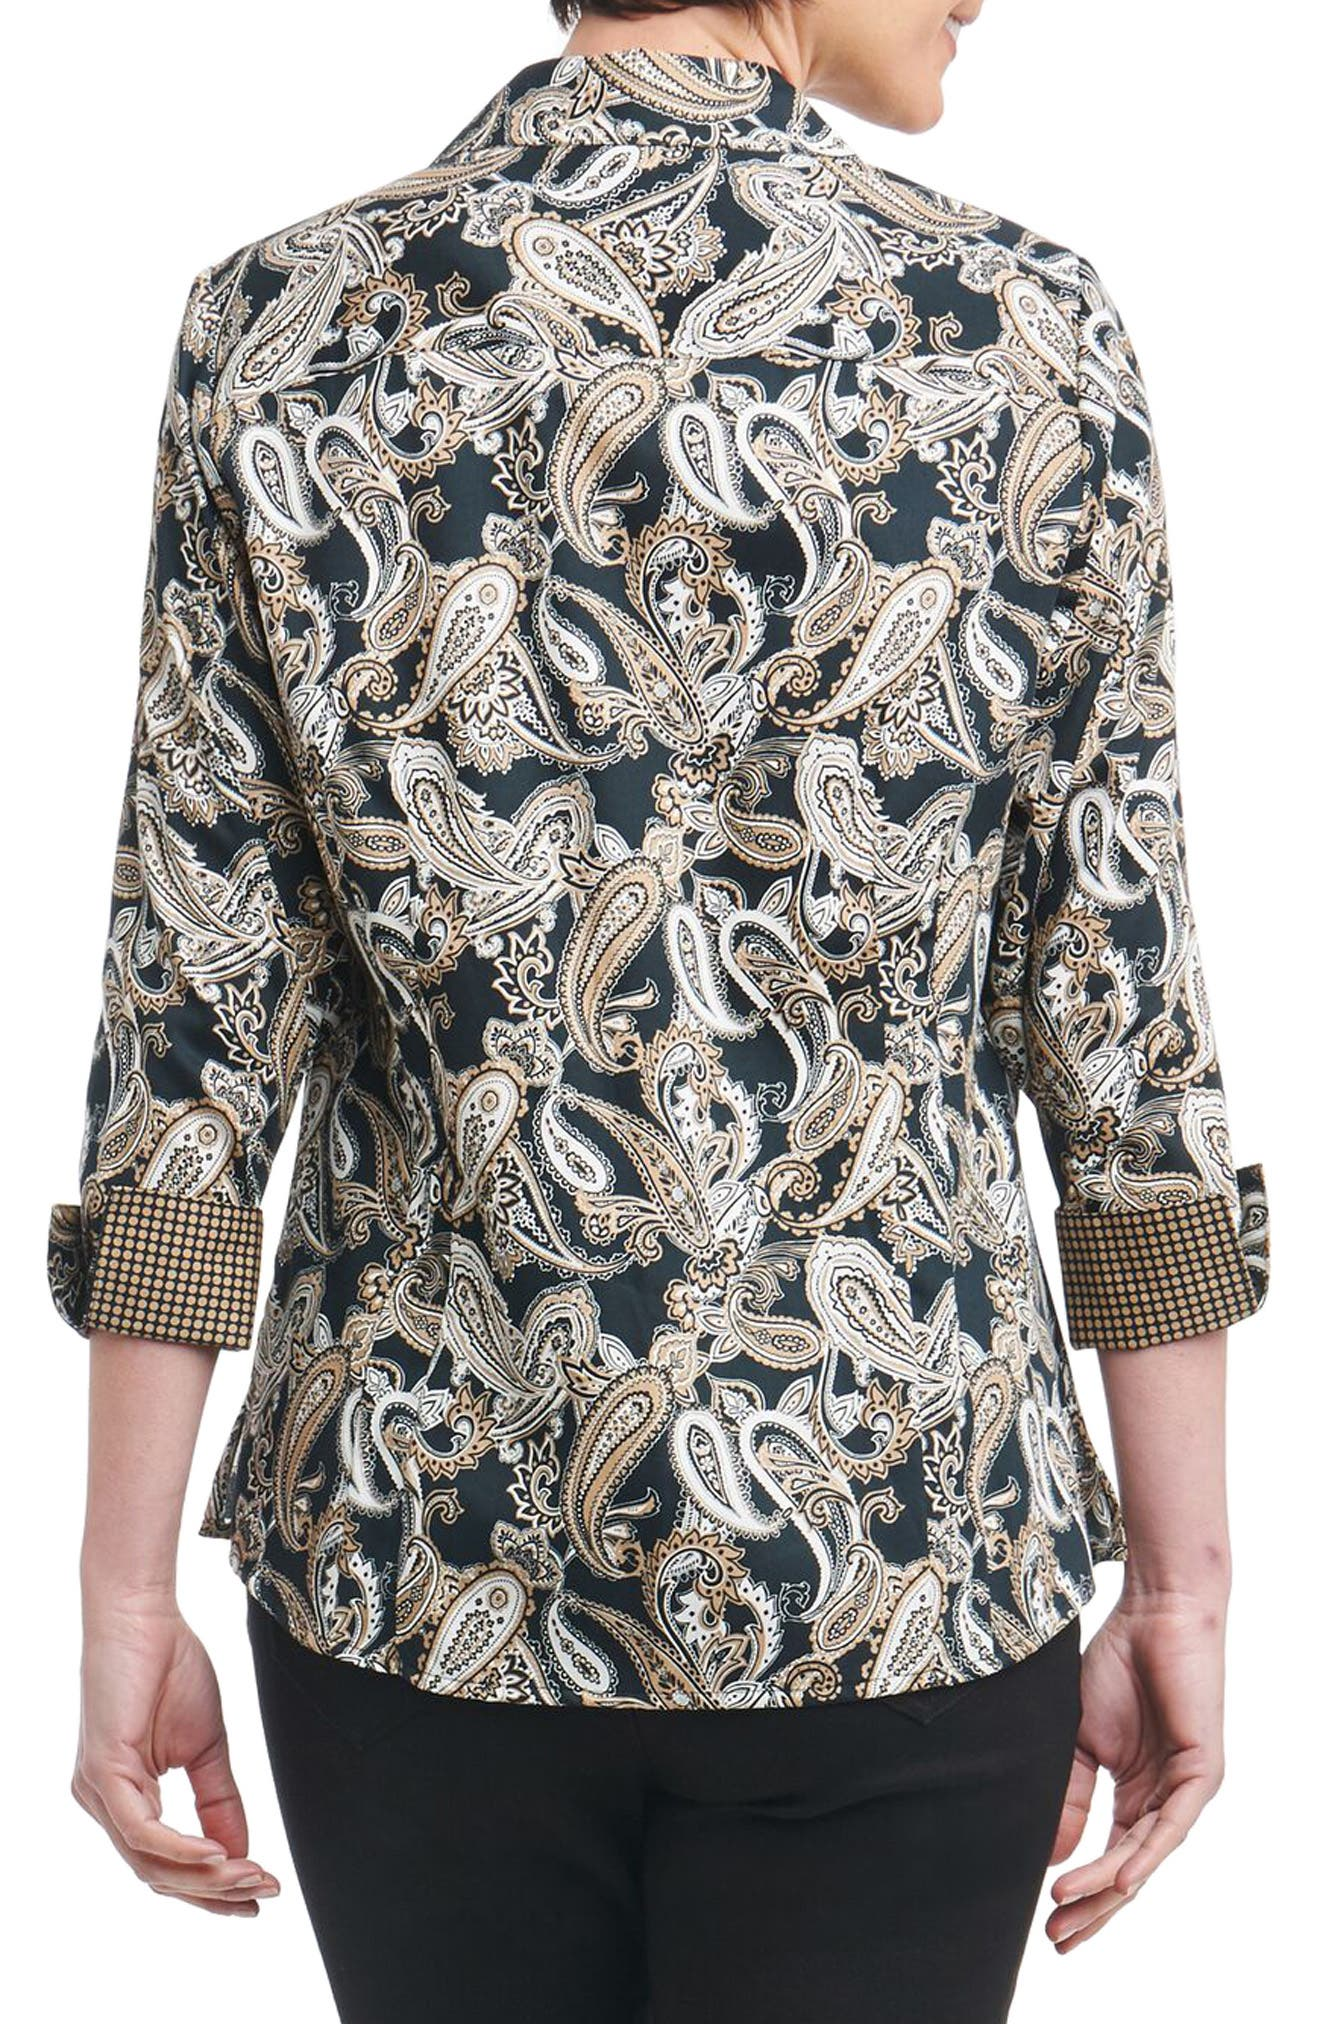 Taylor Heritage Paisley Wrinkle Free Shirt,                             Alternate thumbnail 2, color,                             002